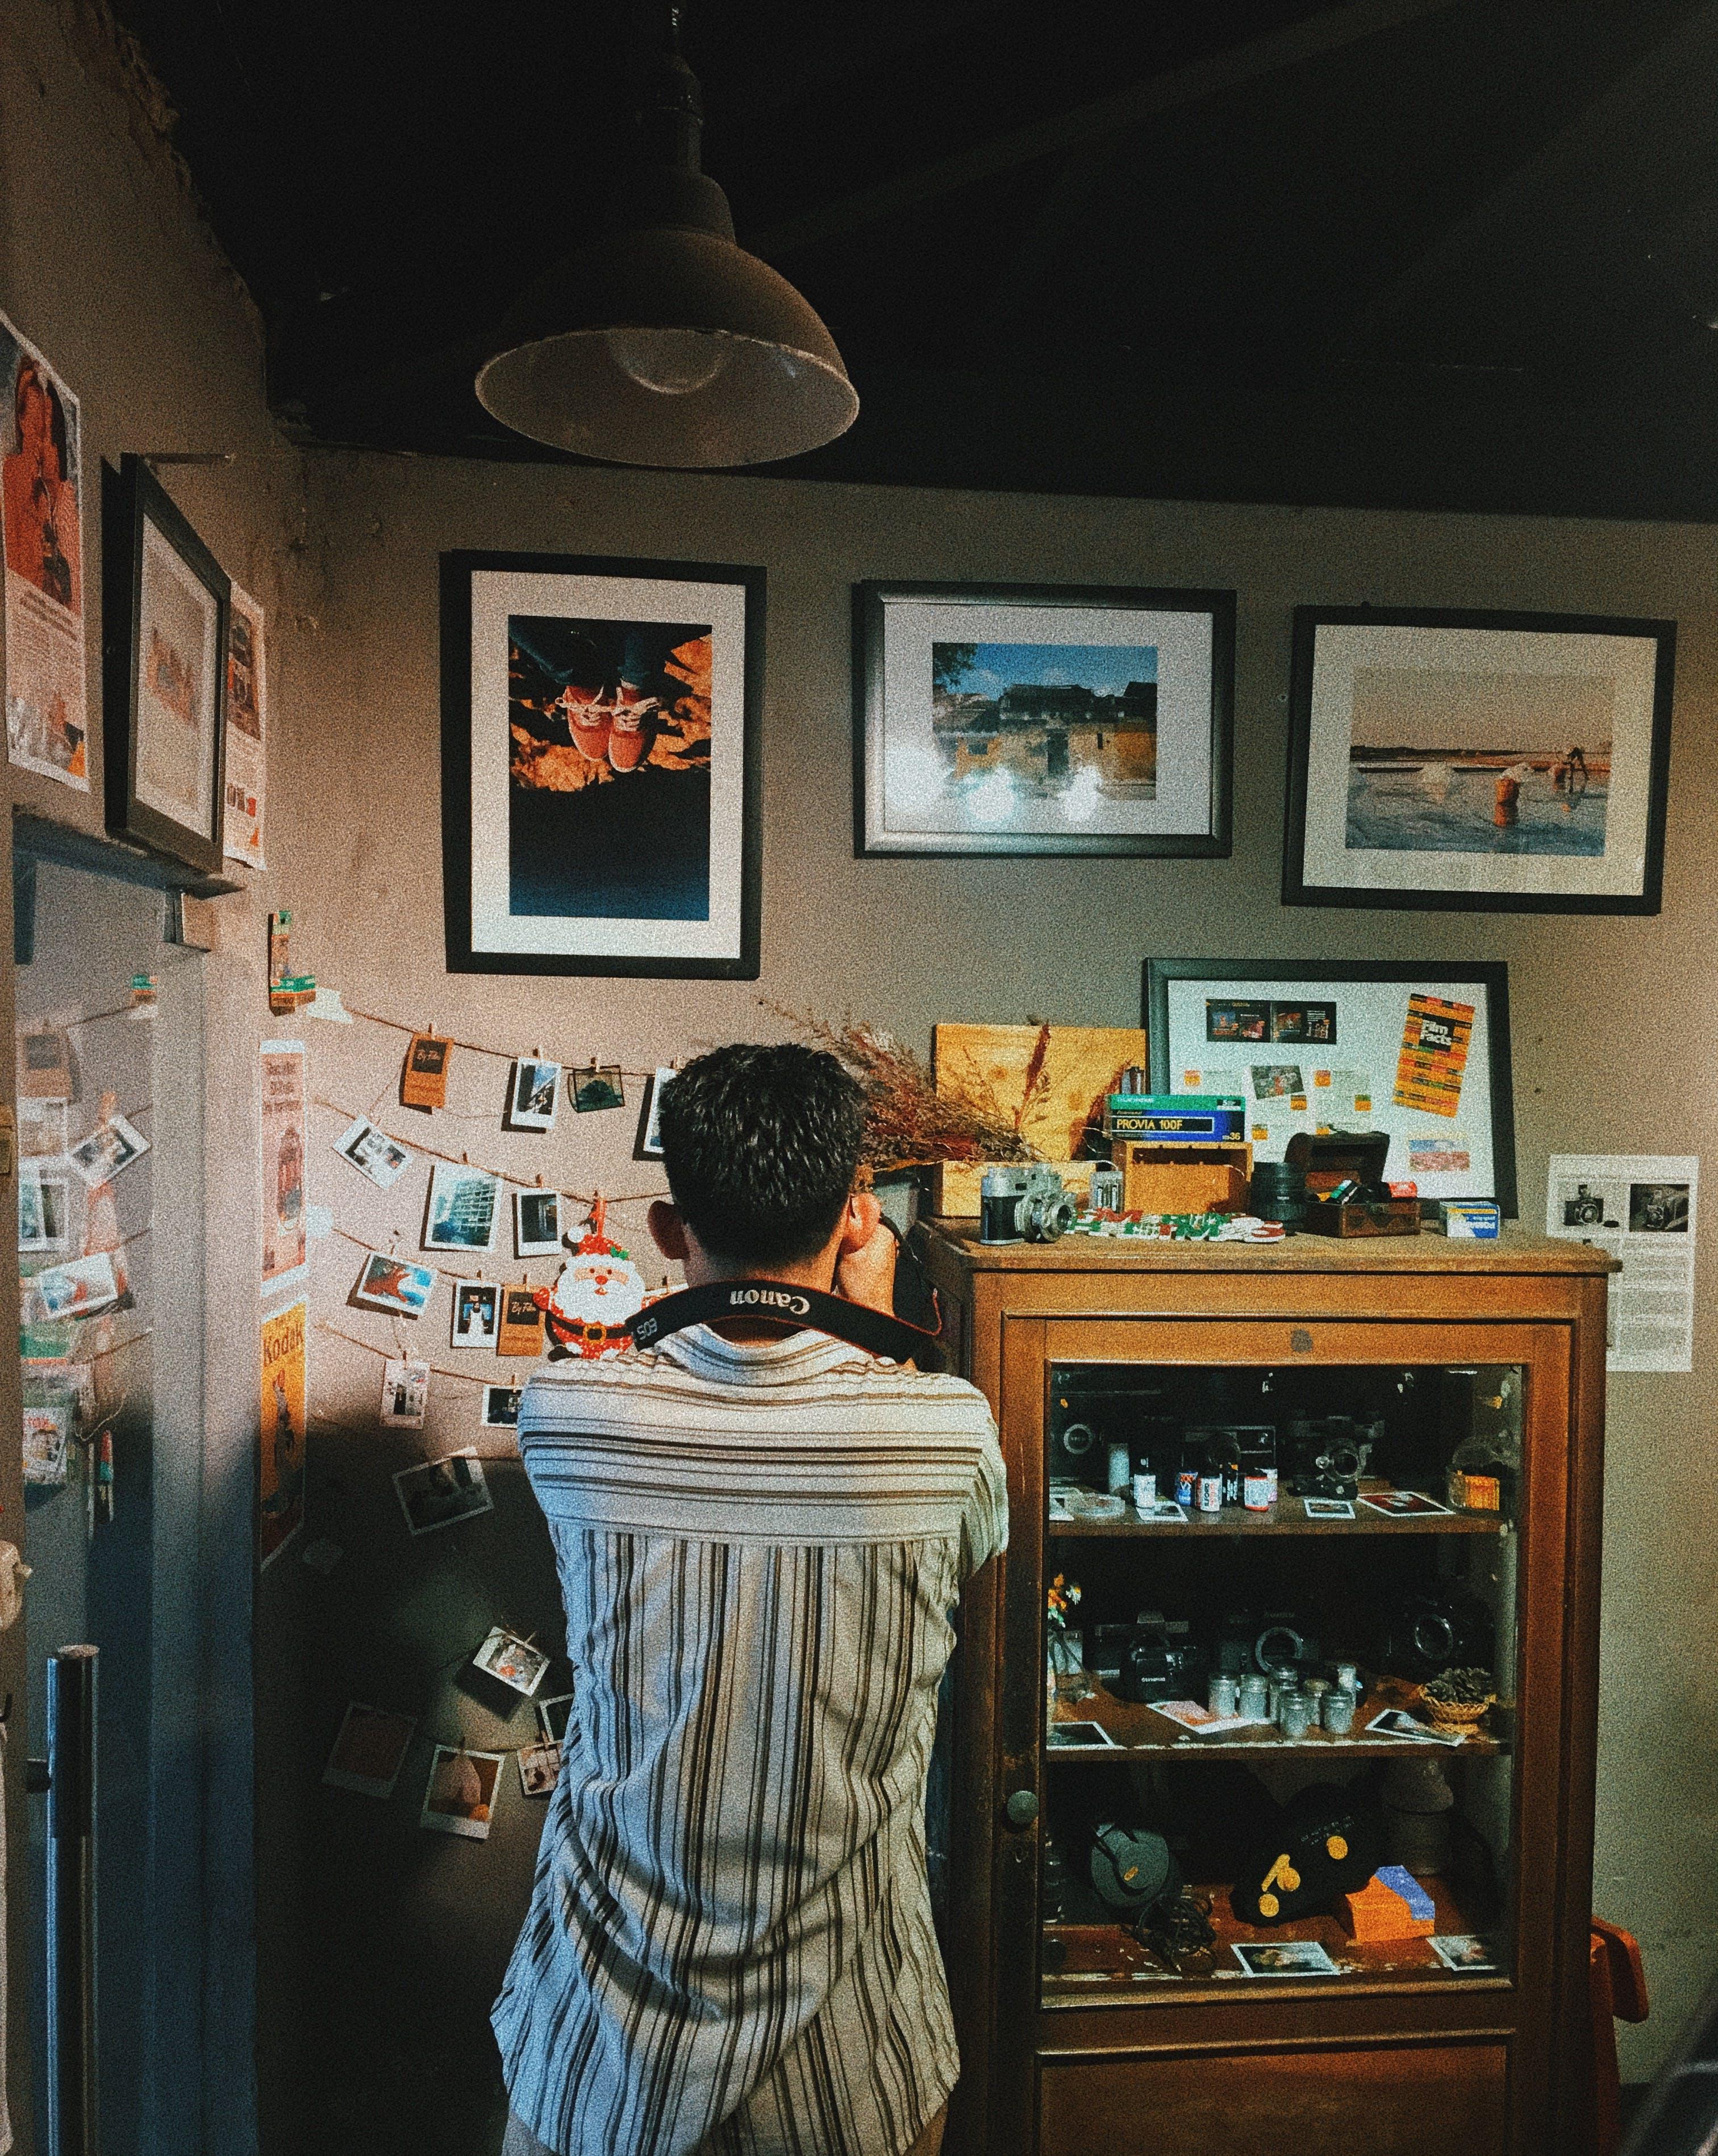 Foto stok gratis foto-foto, fotografer, fotografi, hiasan dinding